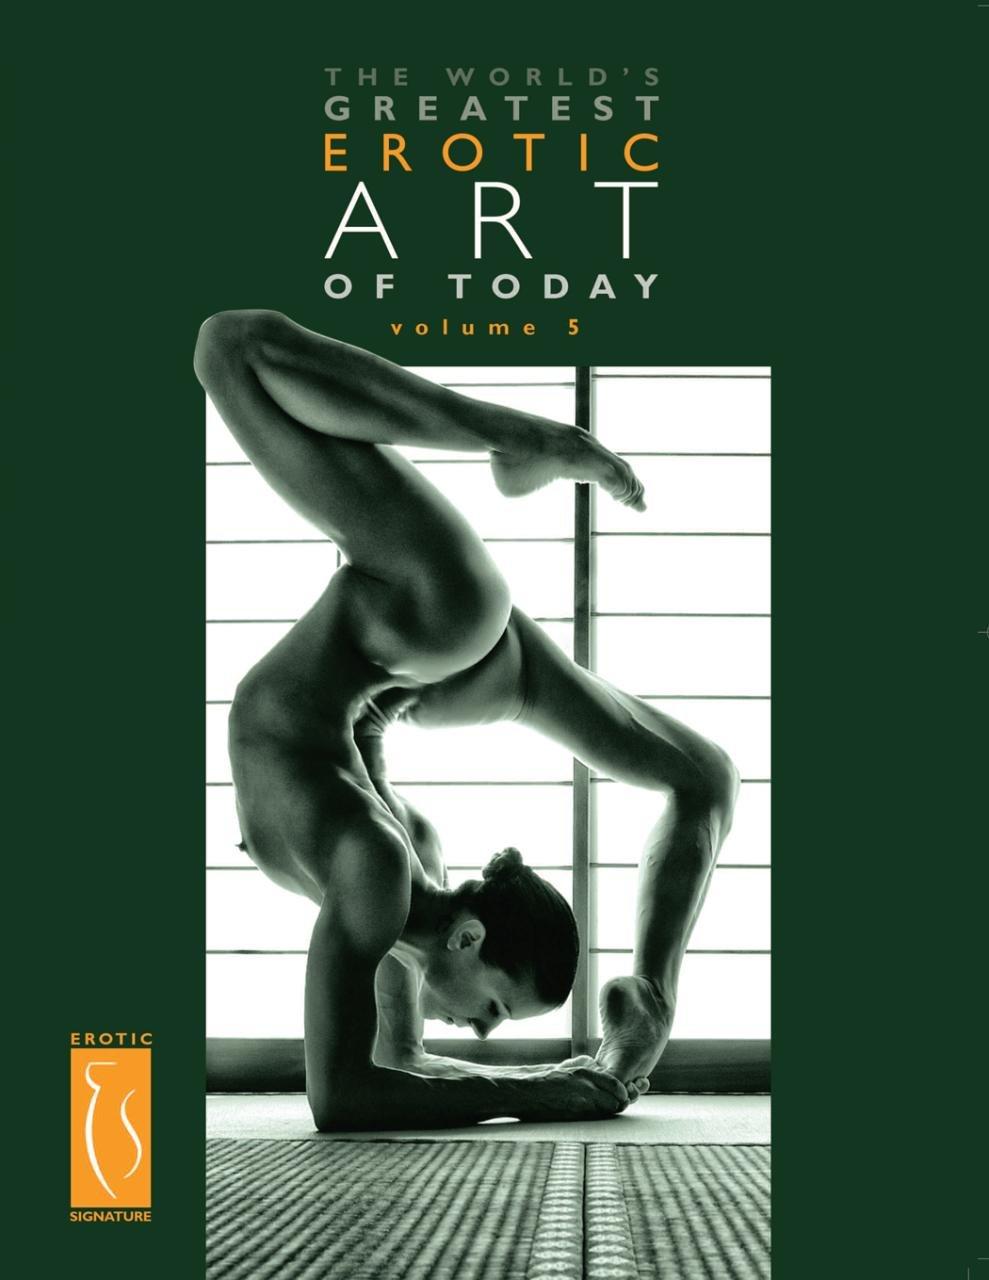 The World's Greatest Erotic Art of Today - Volume 5 (Volume 1)